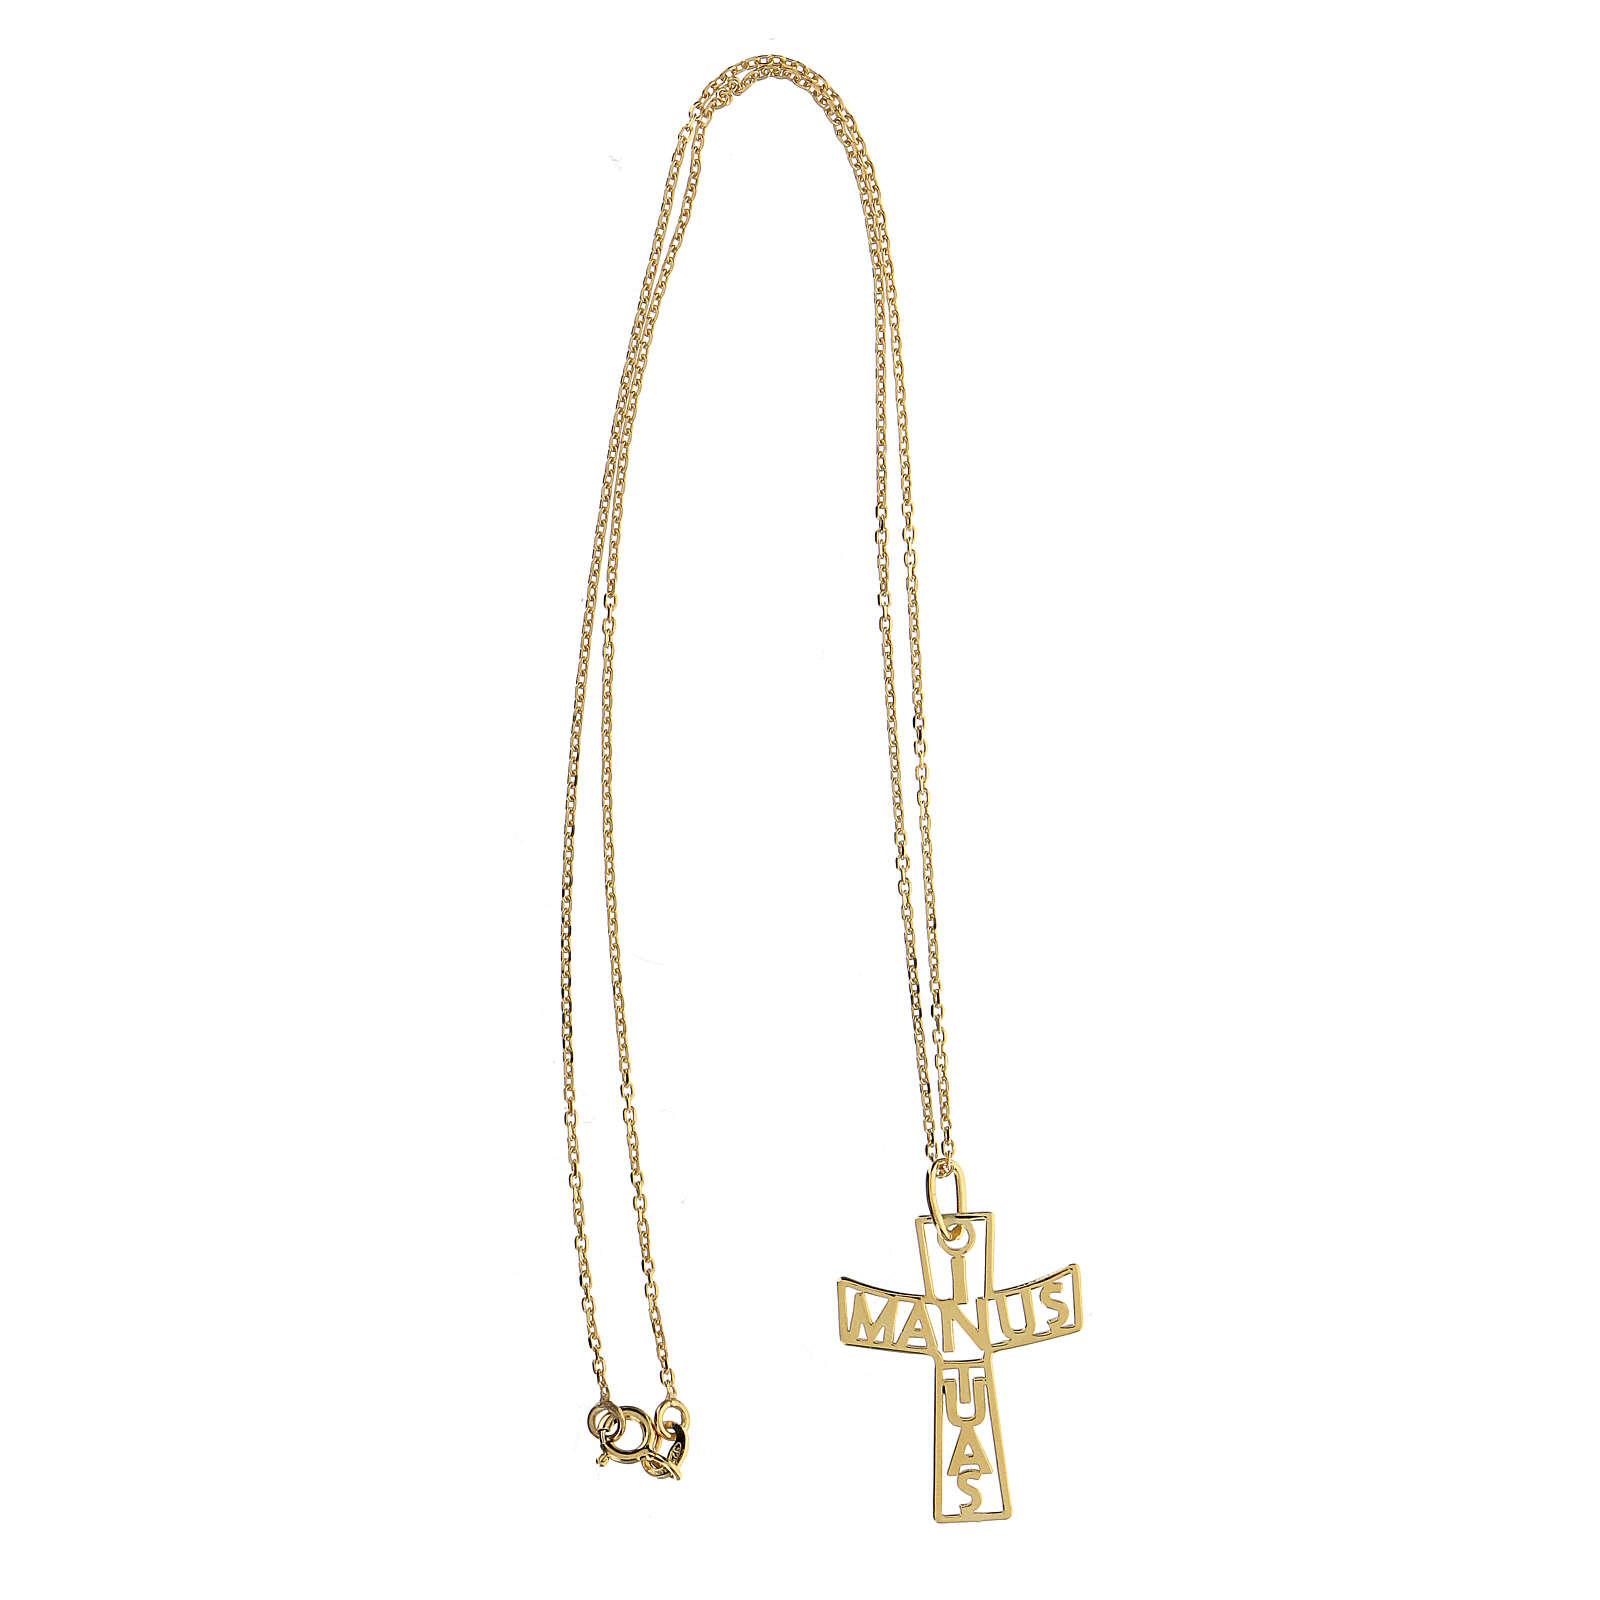 Cruz grande perforada In Manus Tuas plata 925 dorada 4